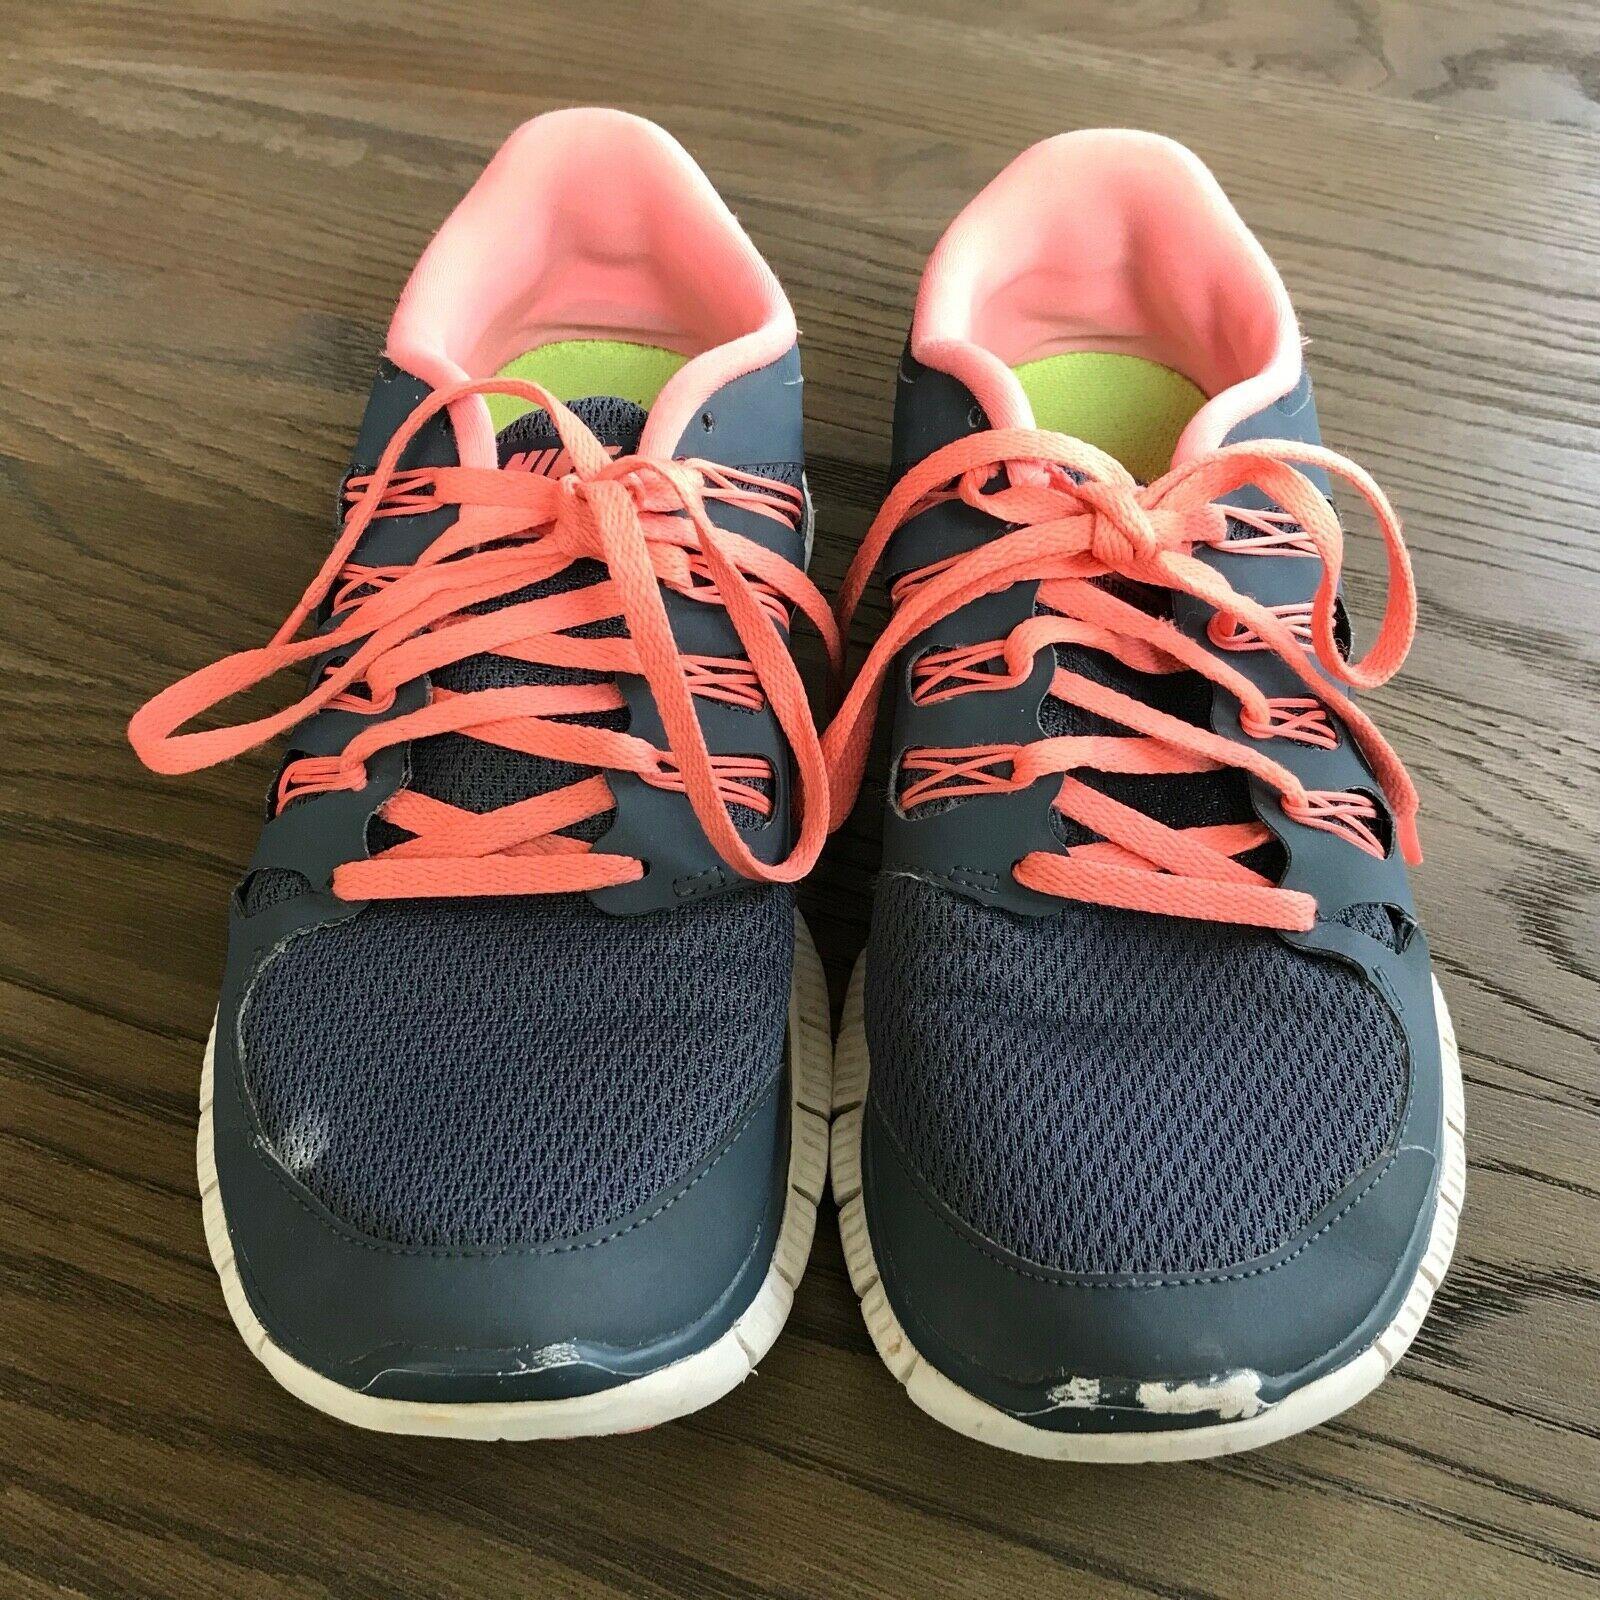 NIKE FREE 5.0 lightweight Gray/Peach Running Sneakers Size 8.5